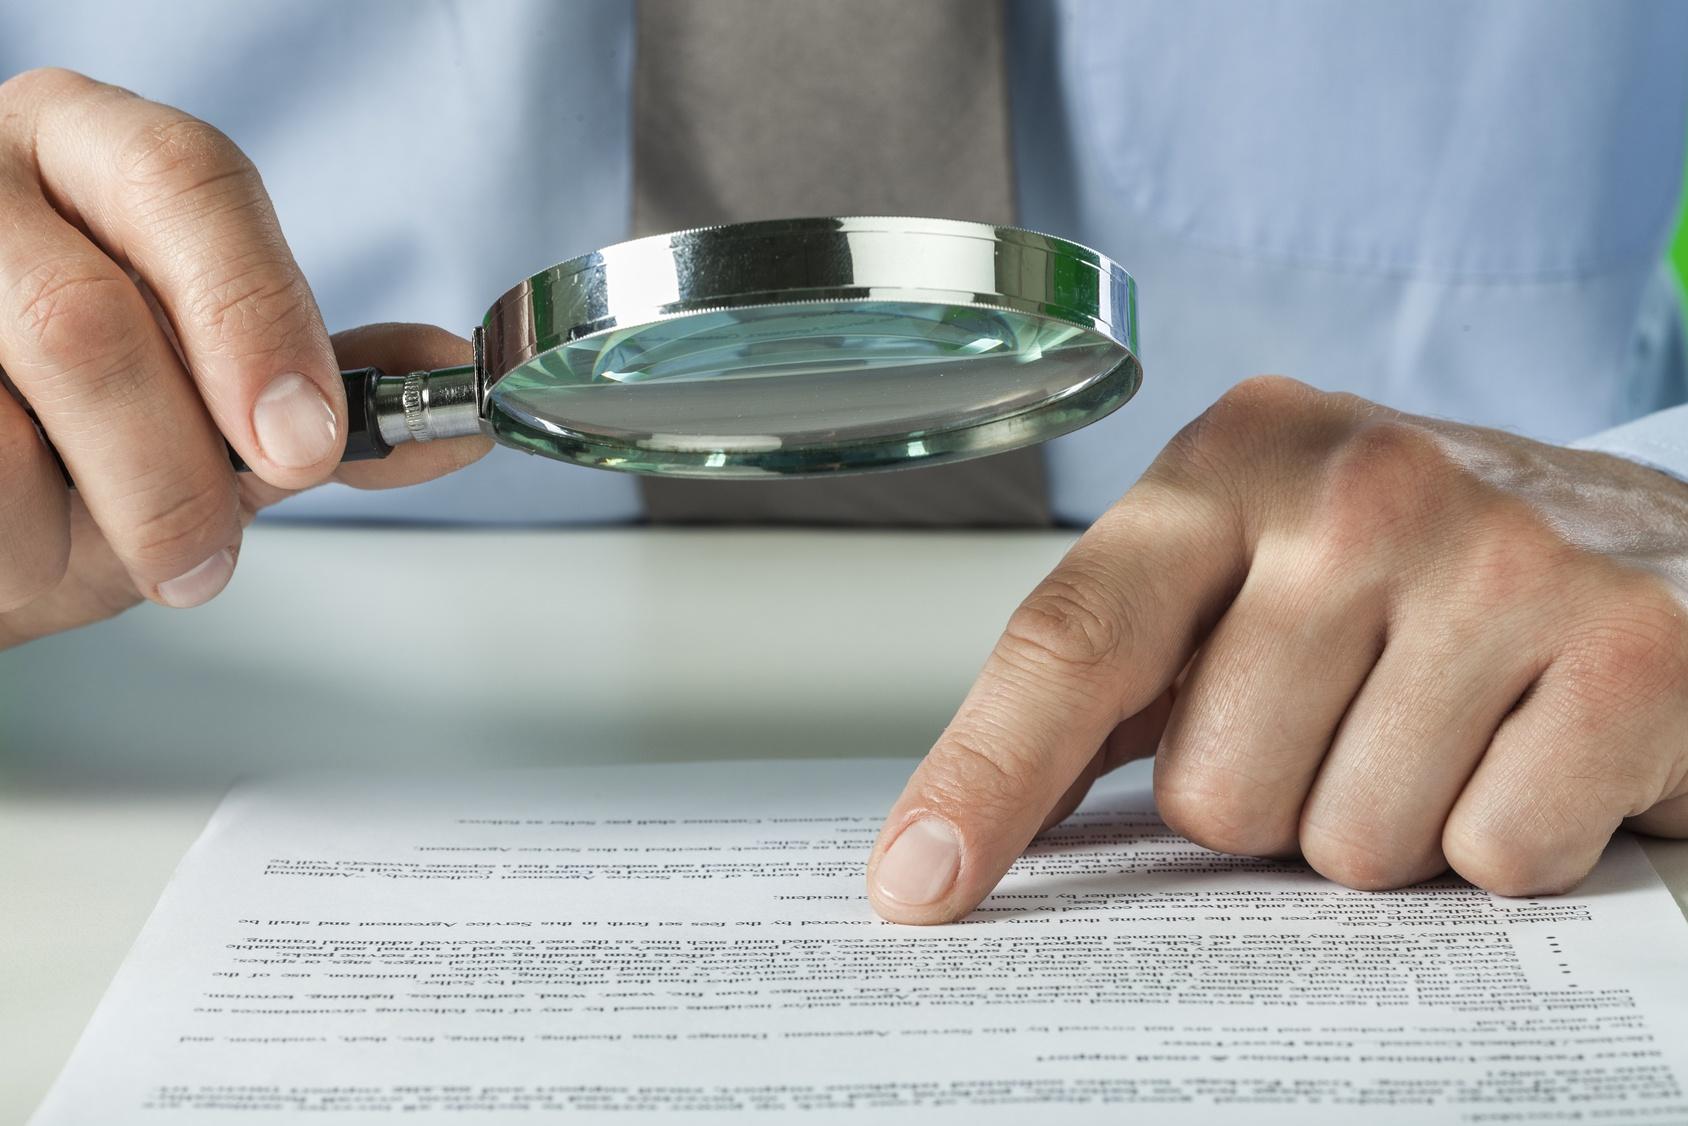 6 Ways to Help Identify a Malicious Email